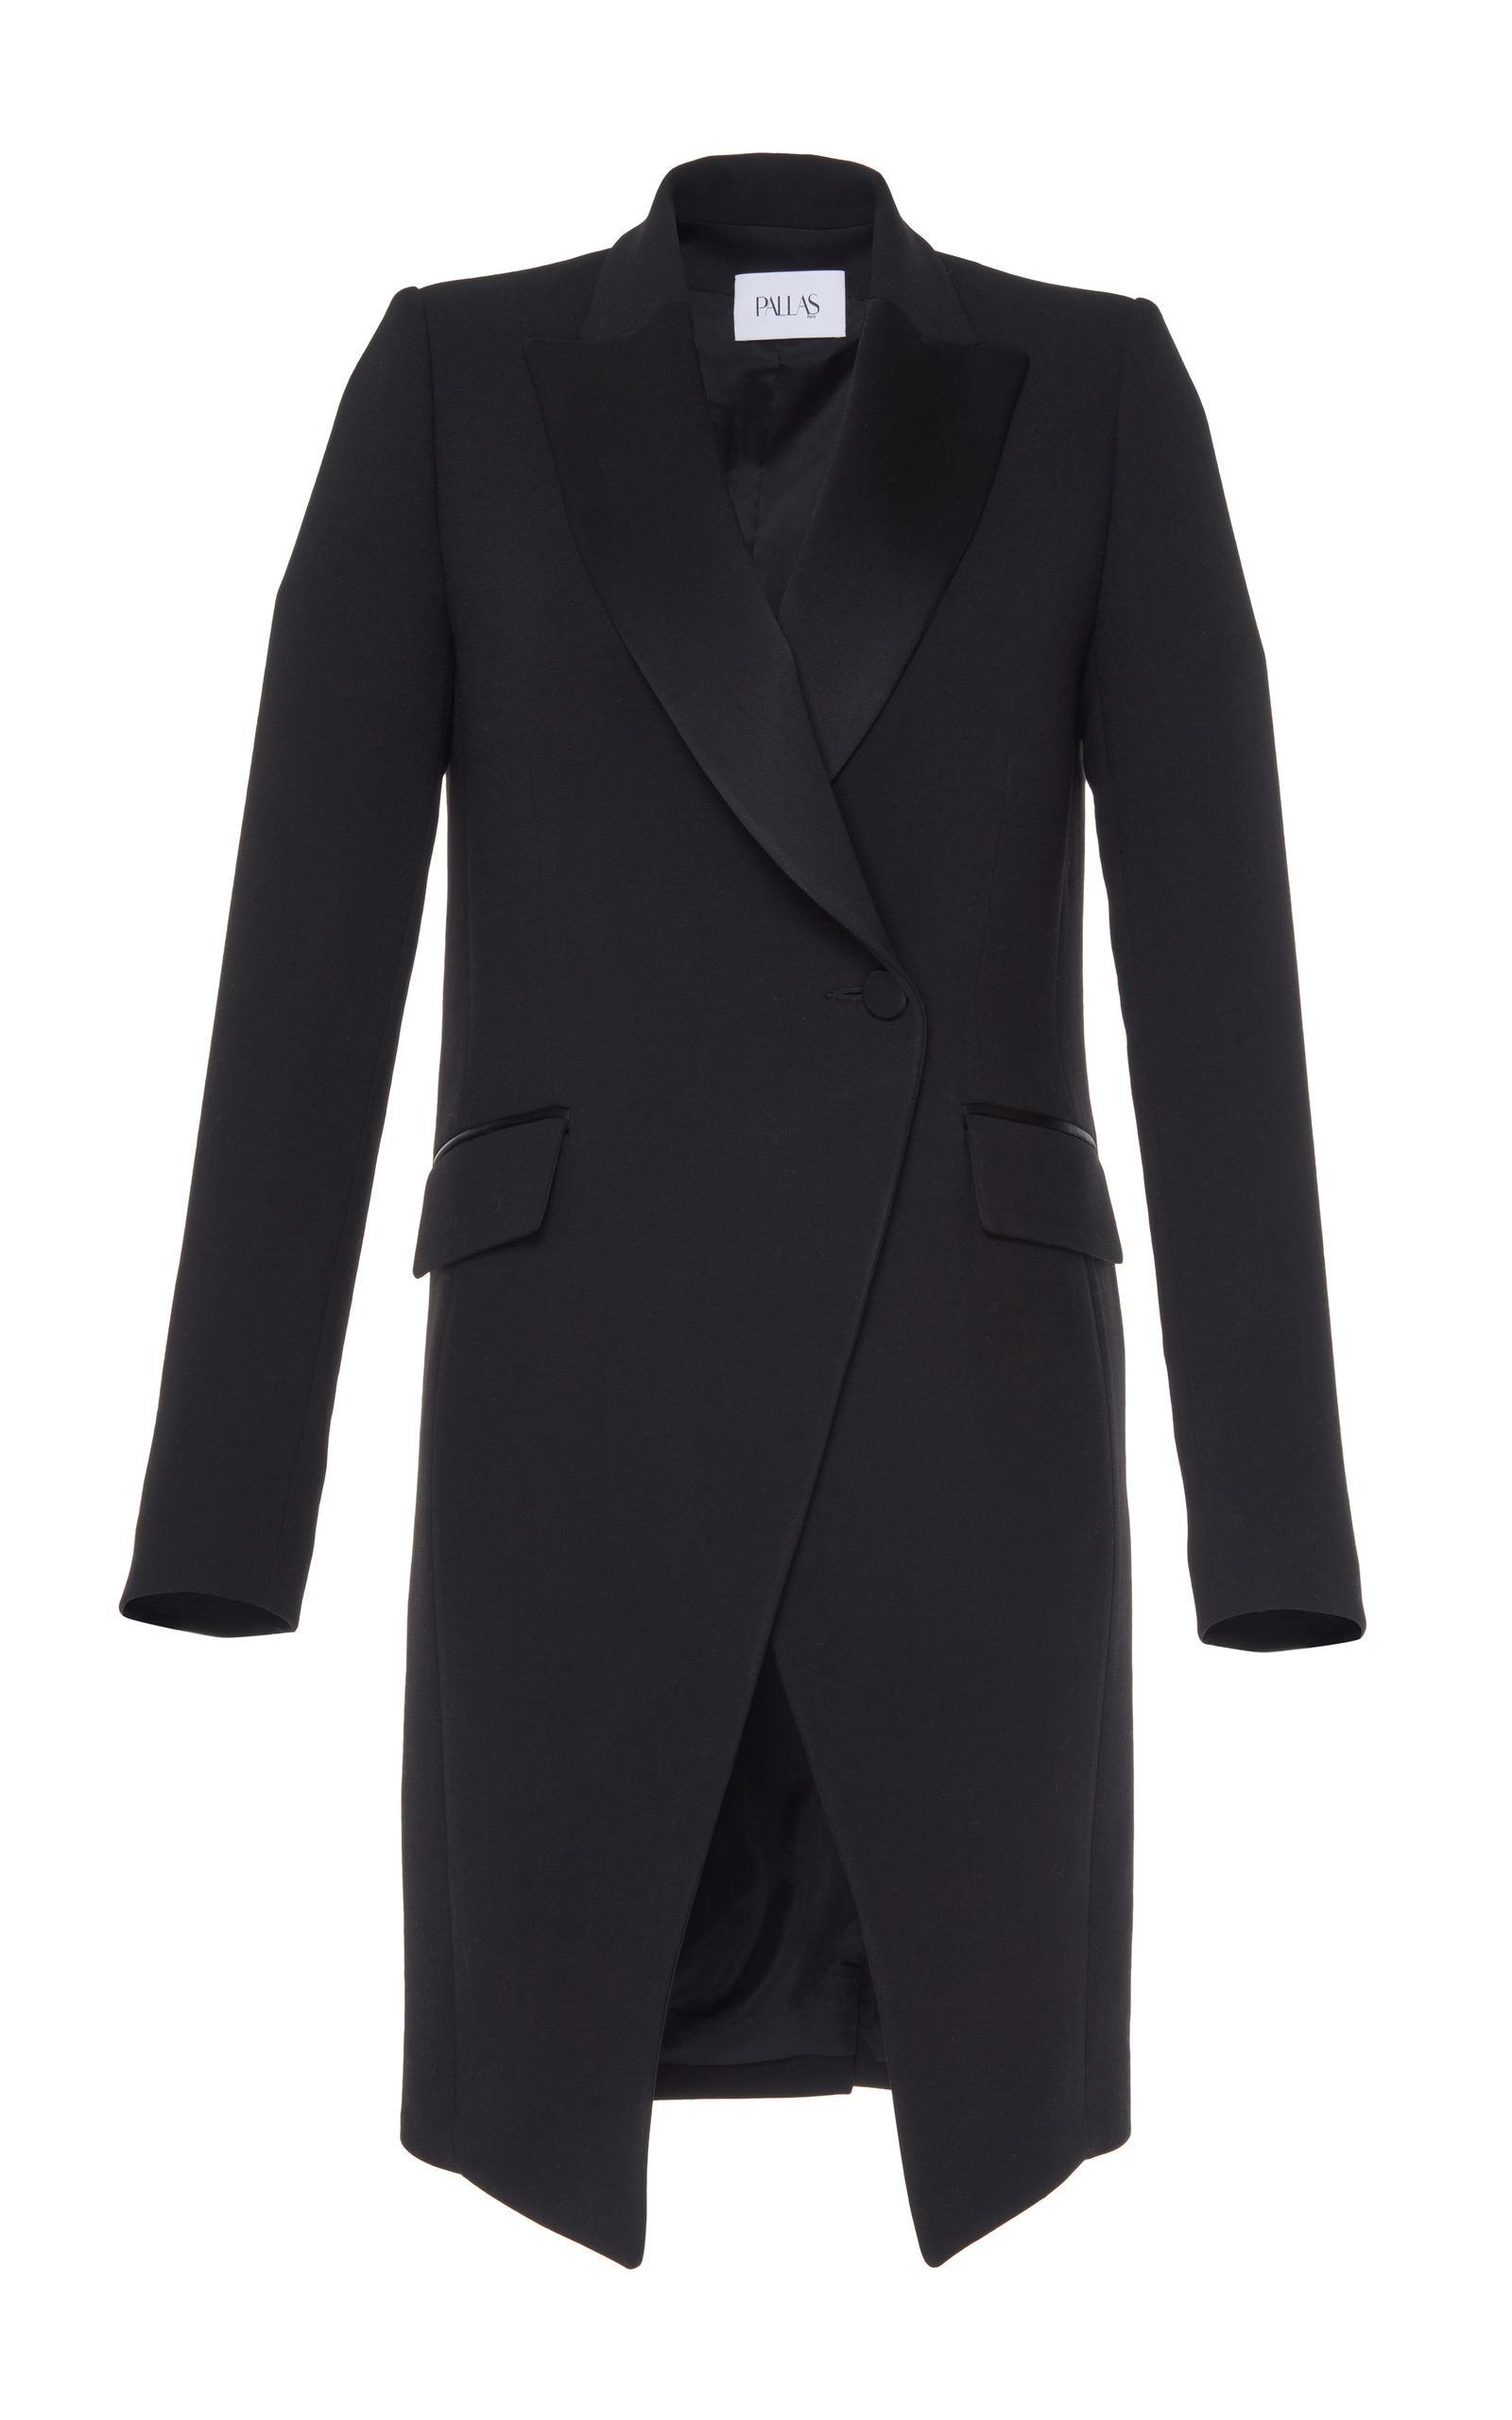 pallas bauhaus long coat in black lyst. Black Bedroom Furniture Sets. Home Design Ideas